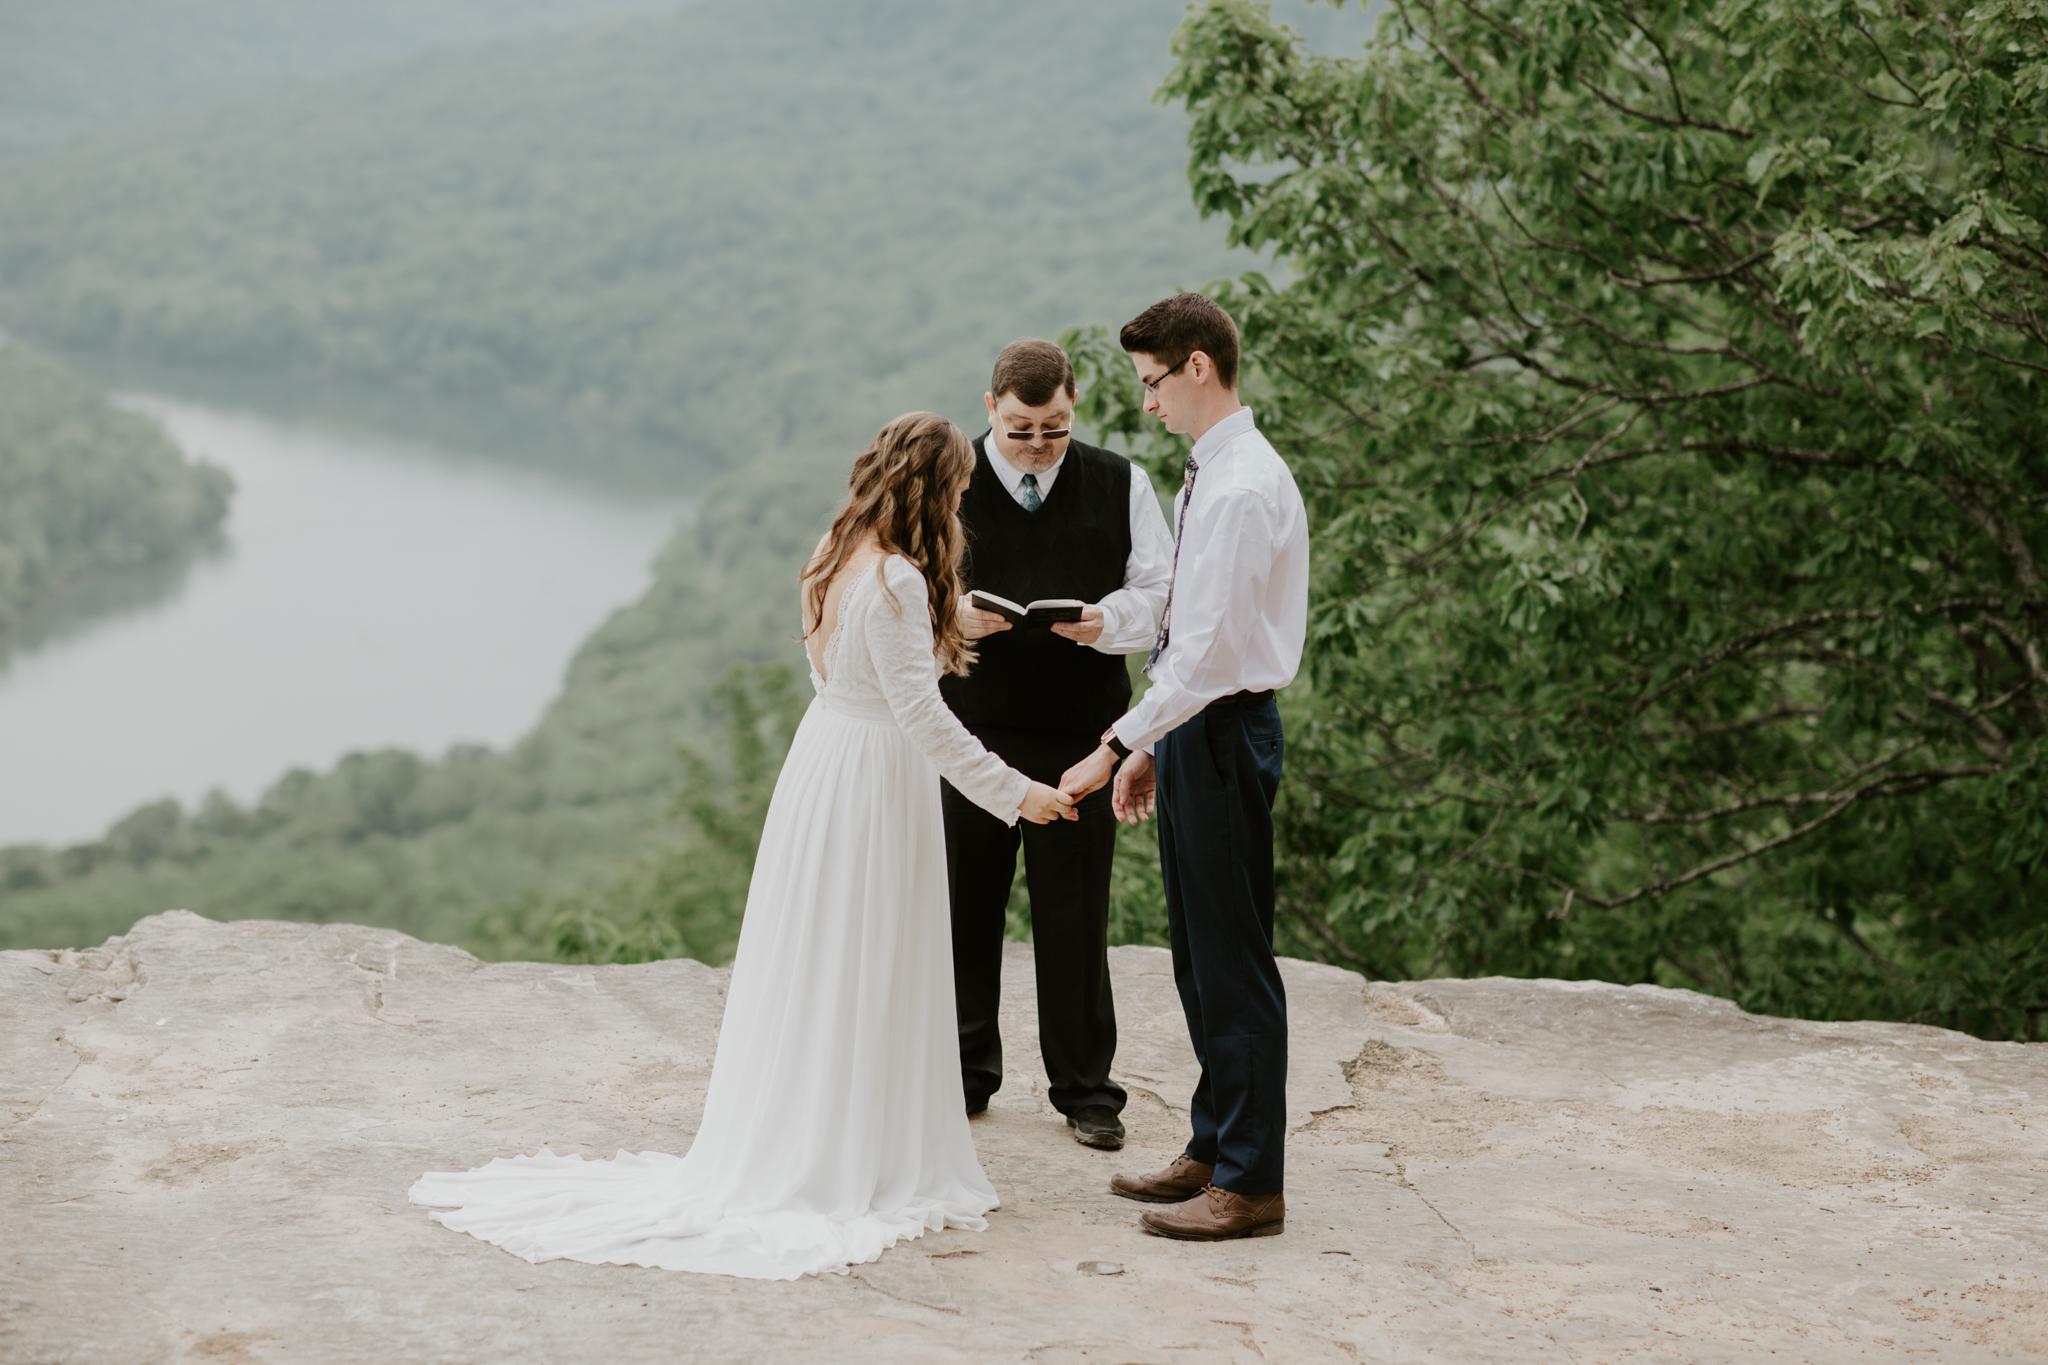 Lacey-Joe-Chattanooga-Nashville-Tennessee-Wedding-Elopement-Photographer-78.jpg